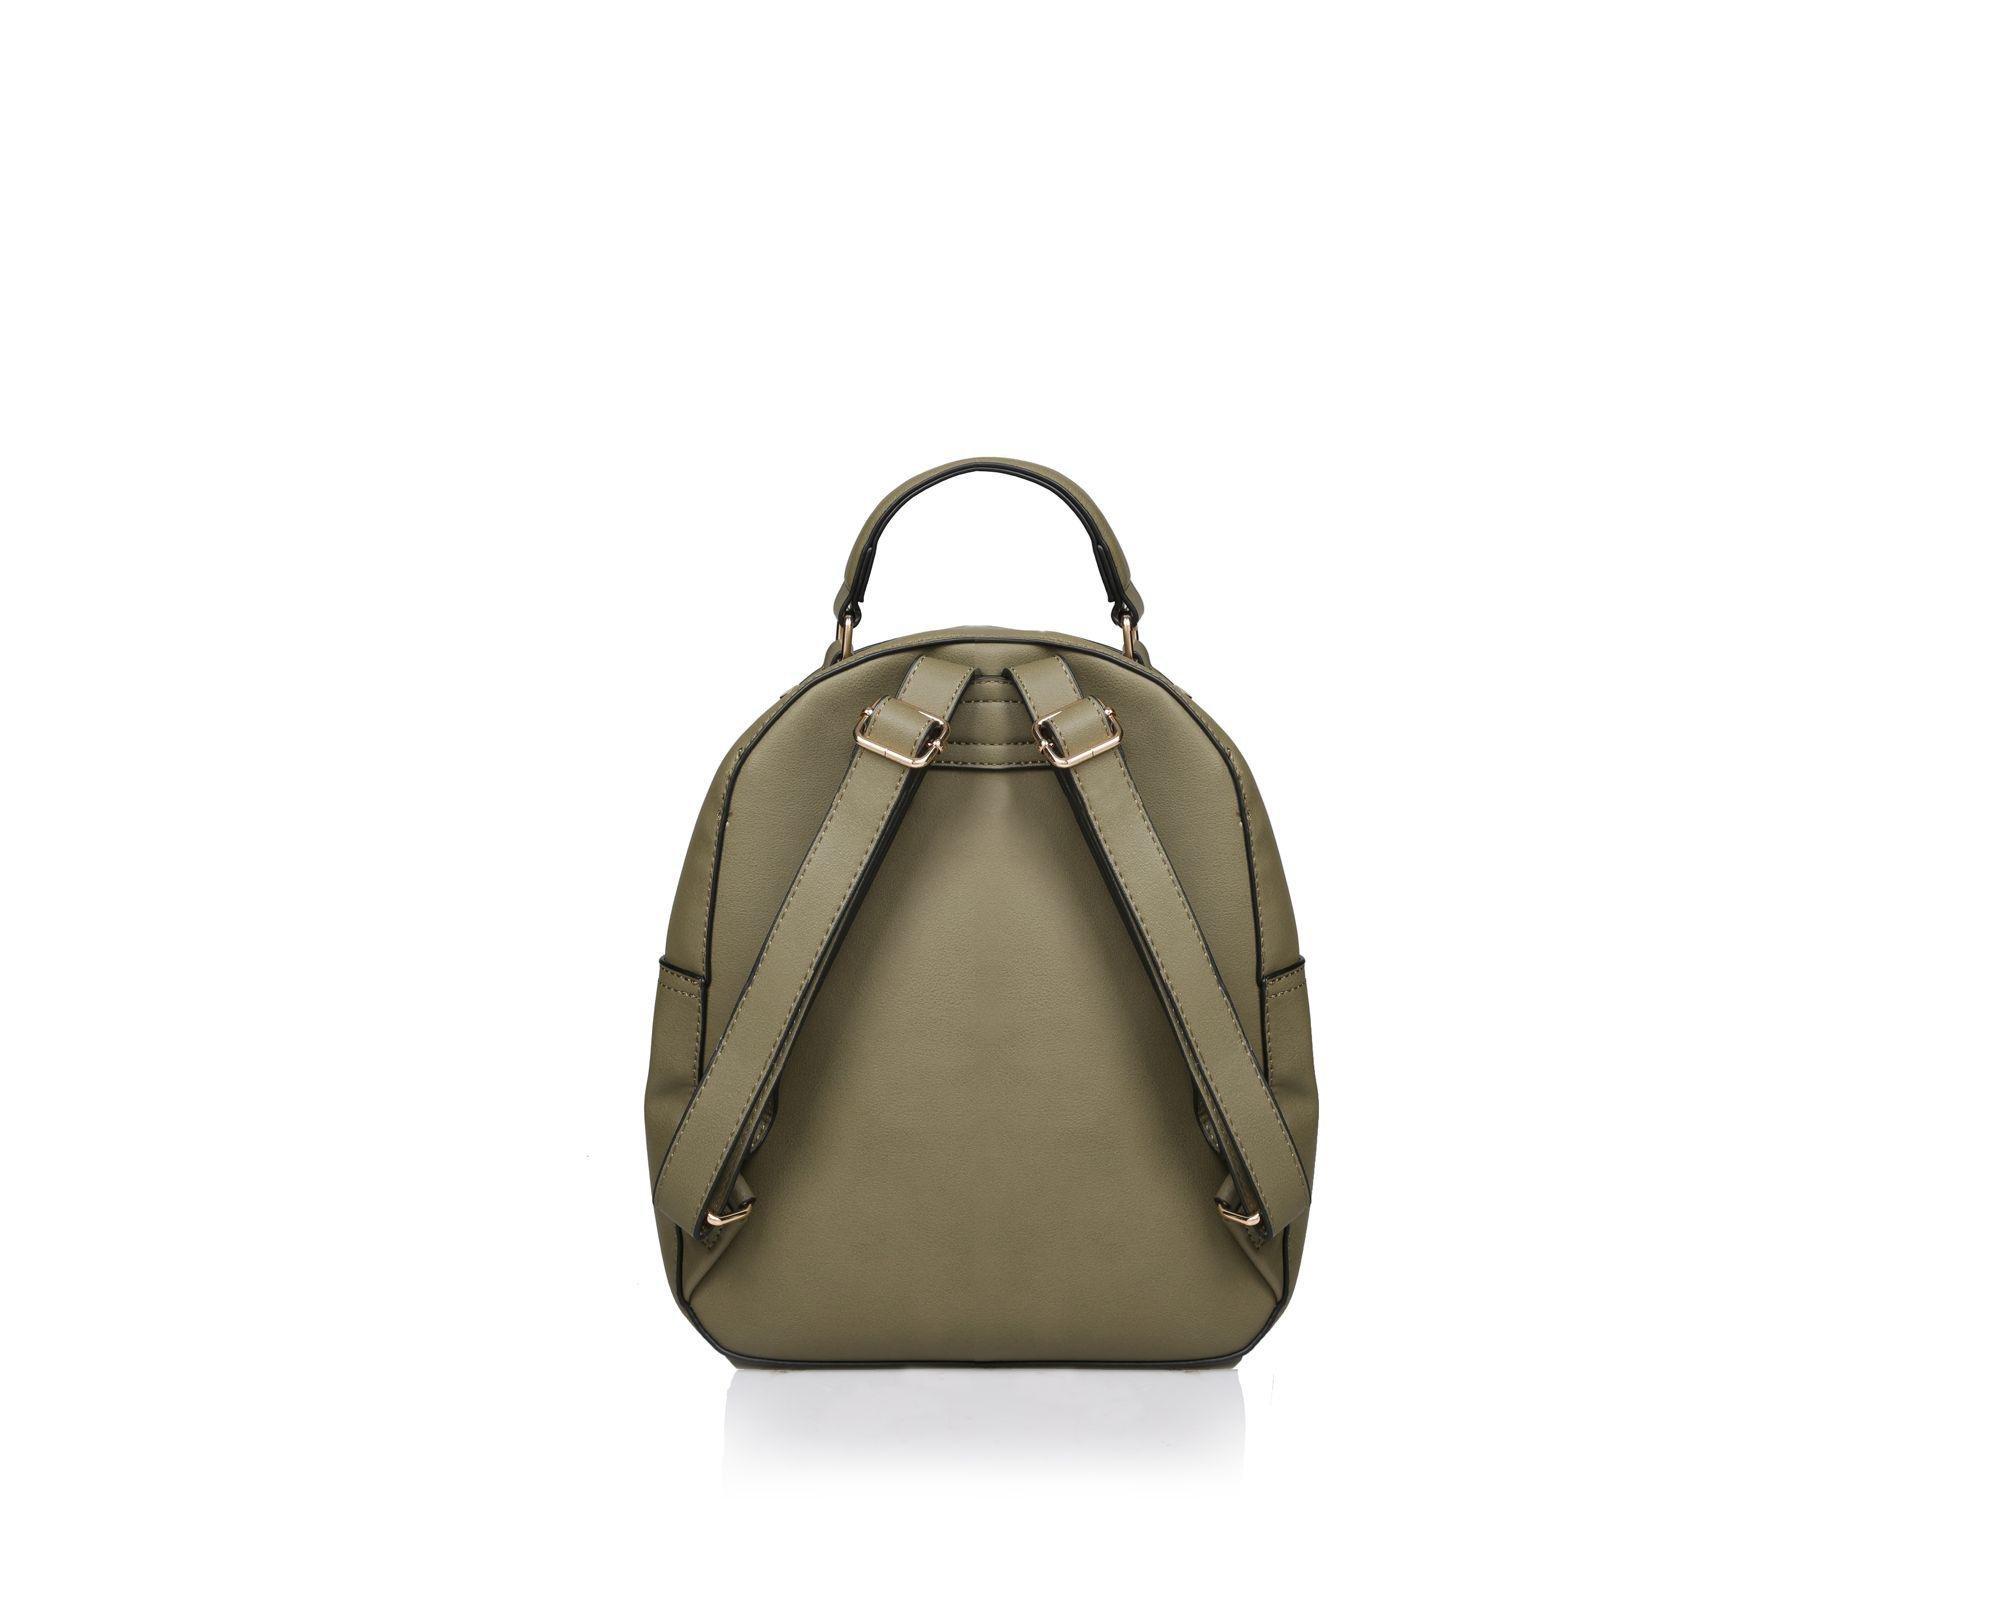 Carvela Kurt Geiger - Brown Khaki  blake Zip Front Backpack  Backpack Bag -  Lyst. View fullscreen 4ef1be6076